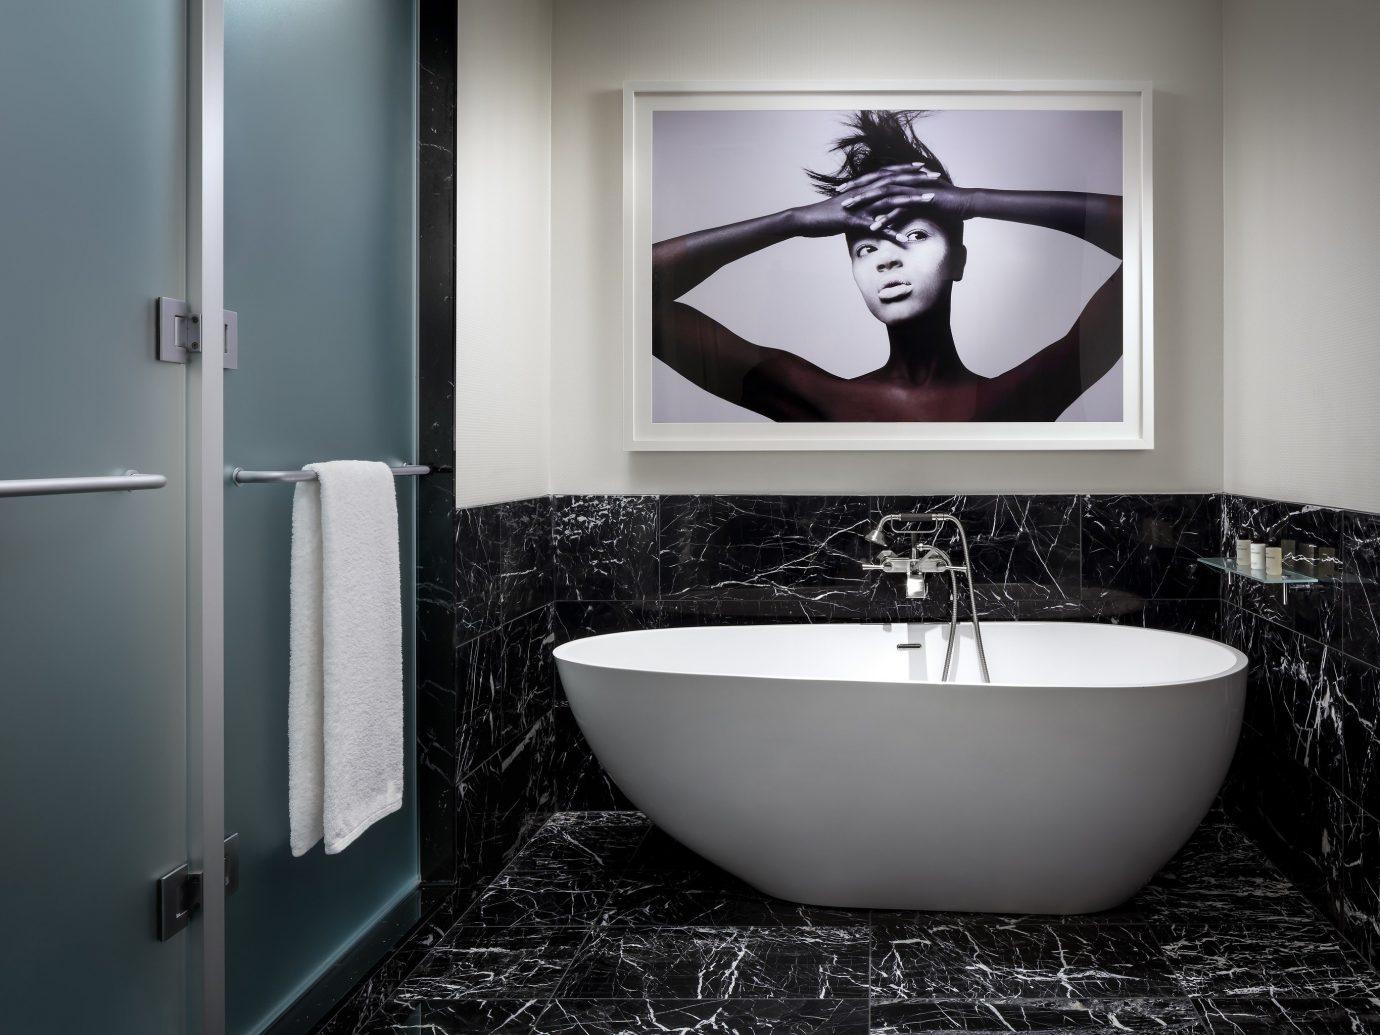 Canada Hotels Toronto wall bathroom indoor room interior design plumbing fixture white sink tap product design bathroom accessory floor flooring angle